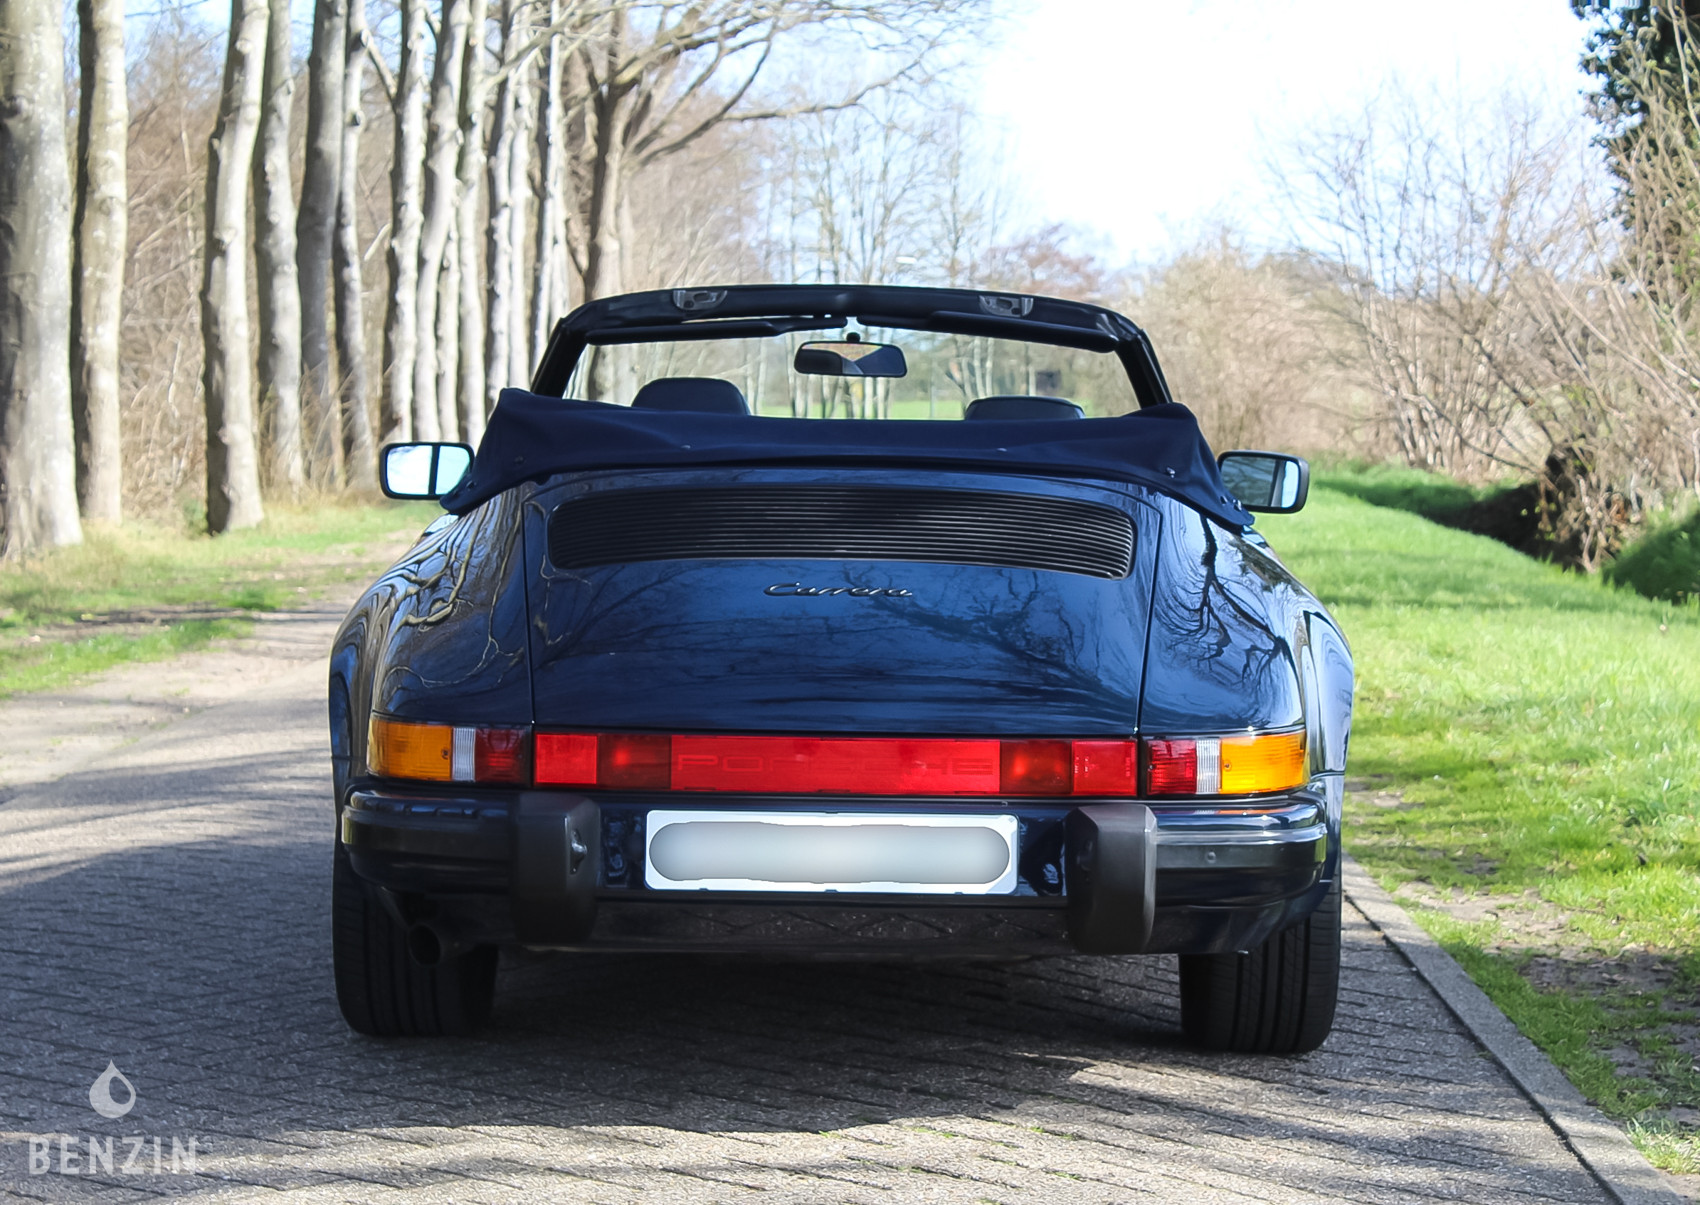 PORSCHE 911 3.2 G50 1986 FOR SALE EN VENTE EN VENDITA TE KOOP SU VERKAUFEN